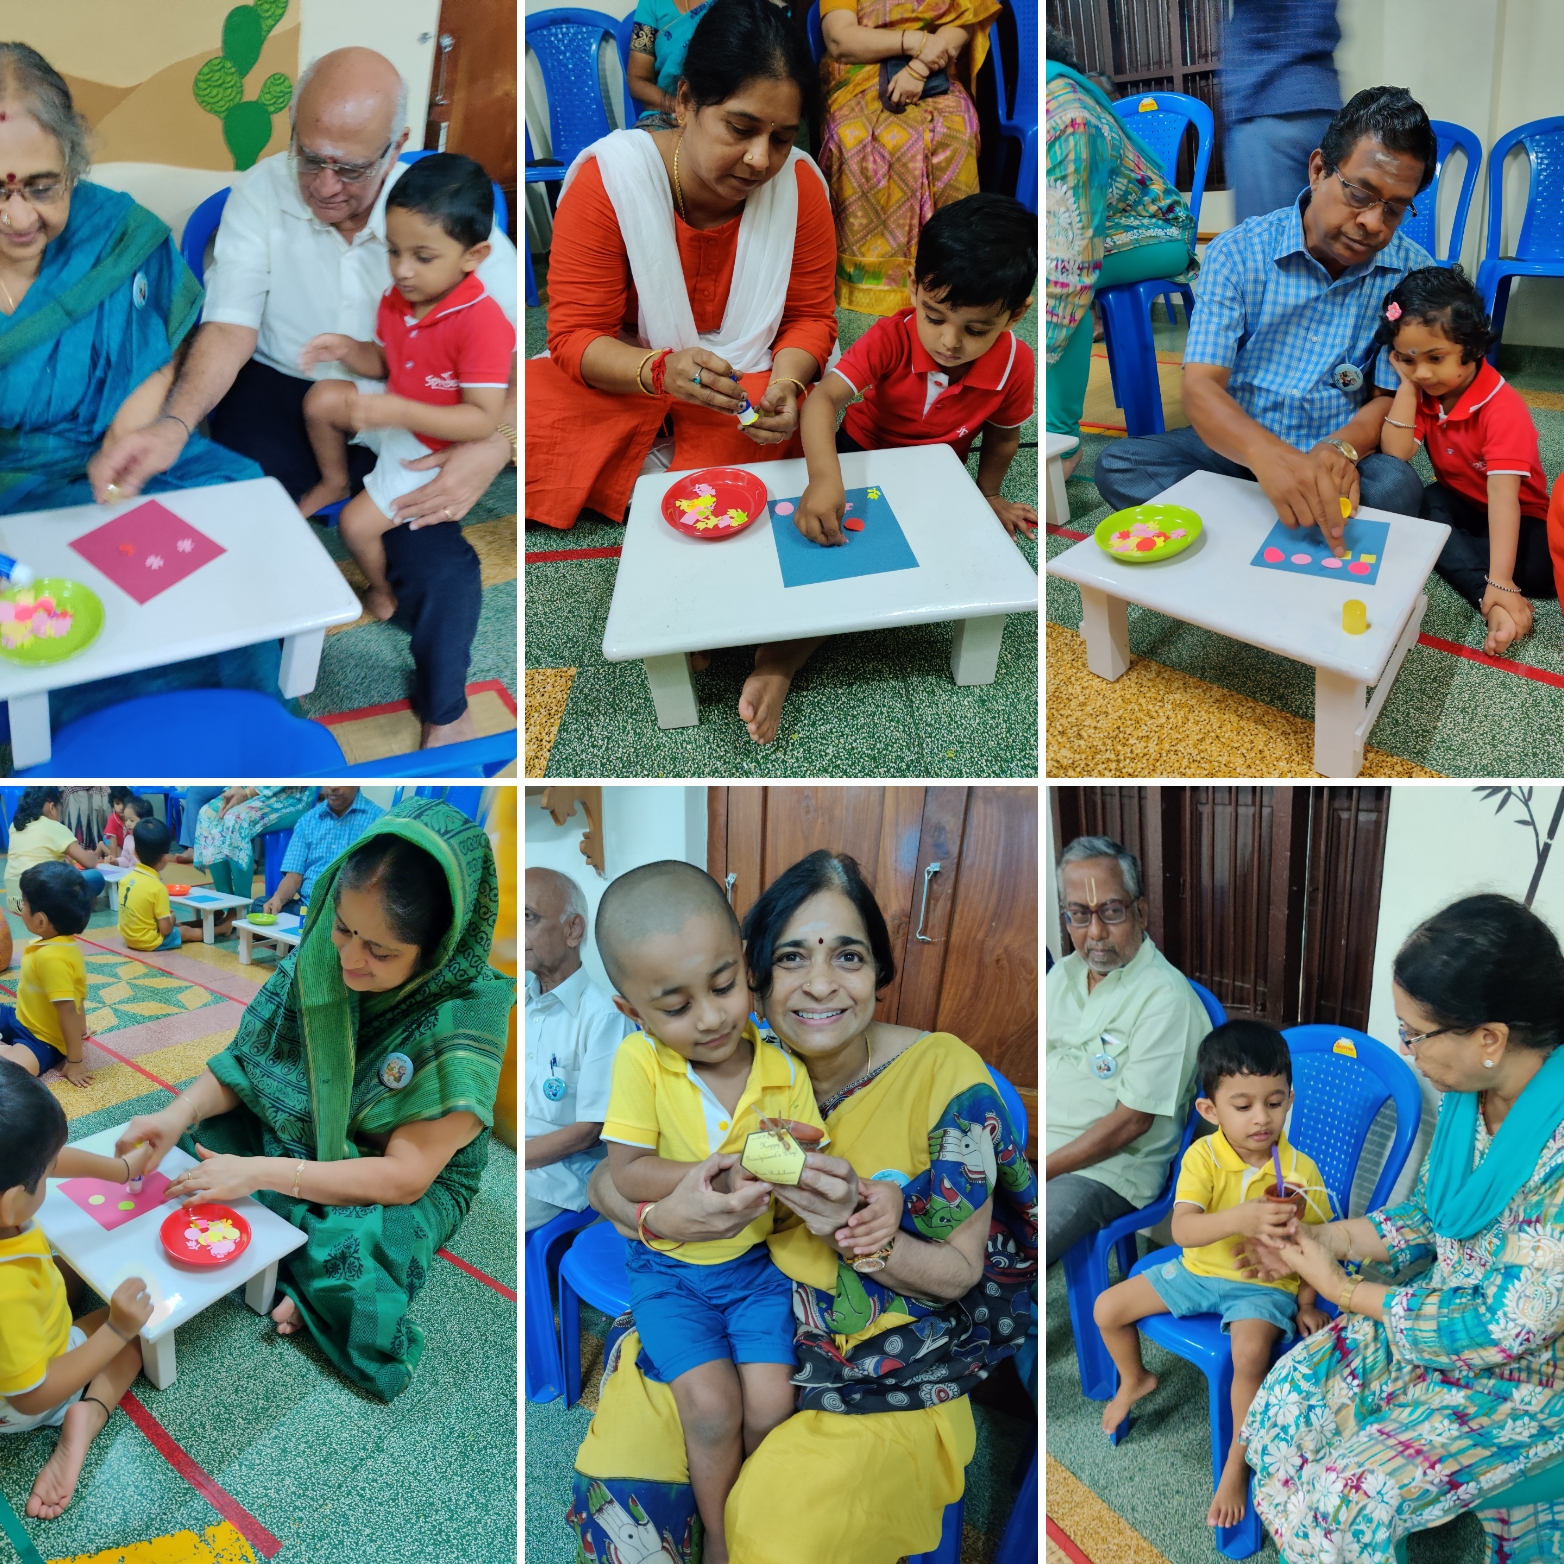 Fun craft activity with Grandparents